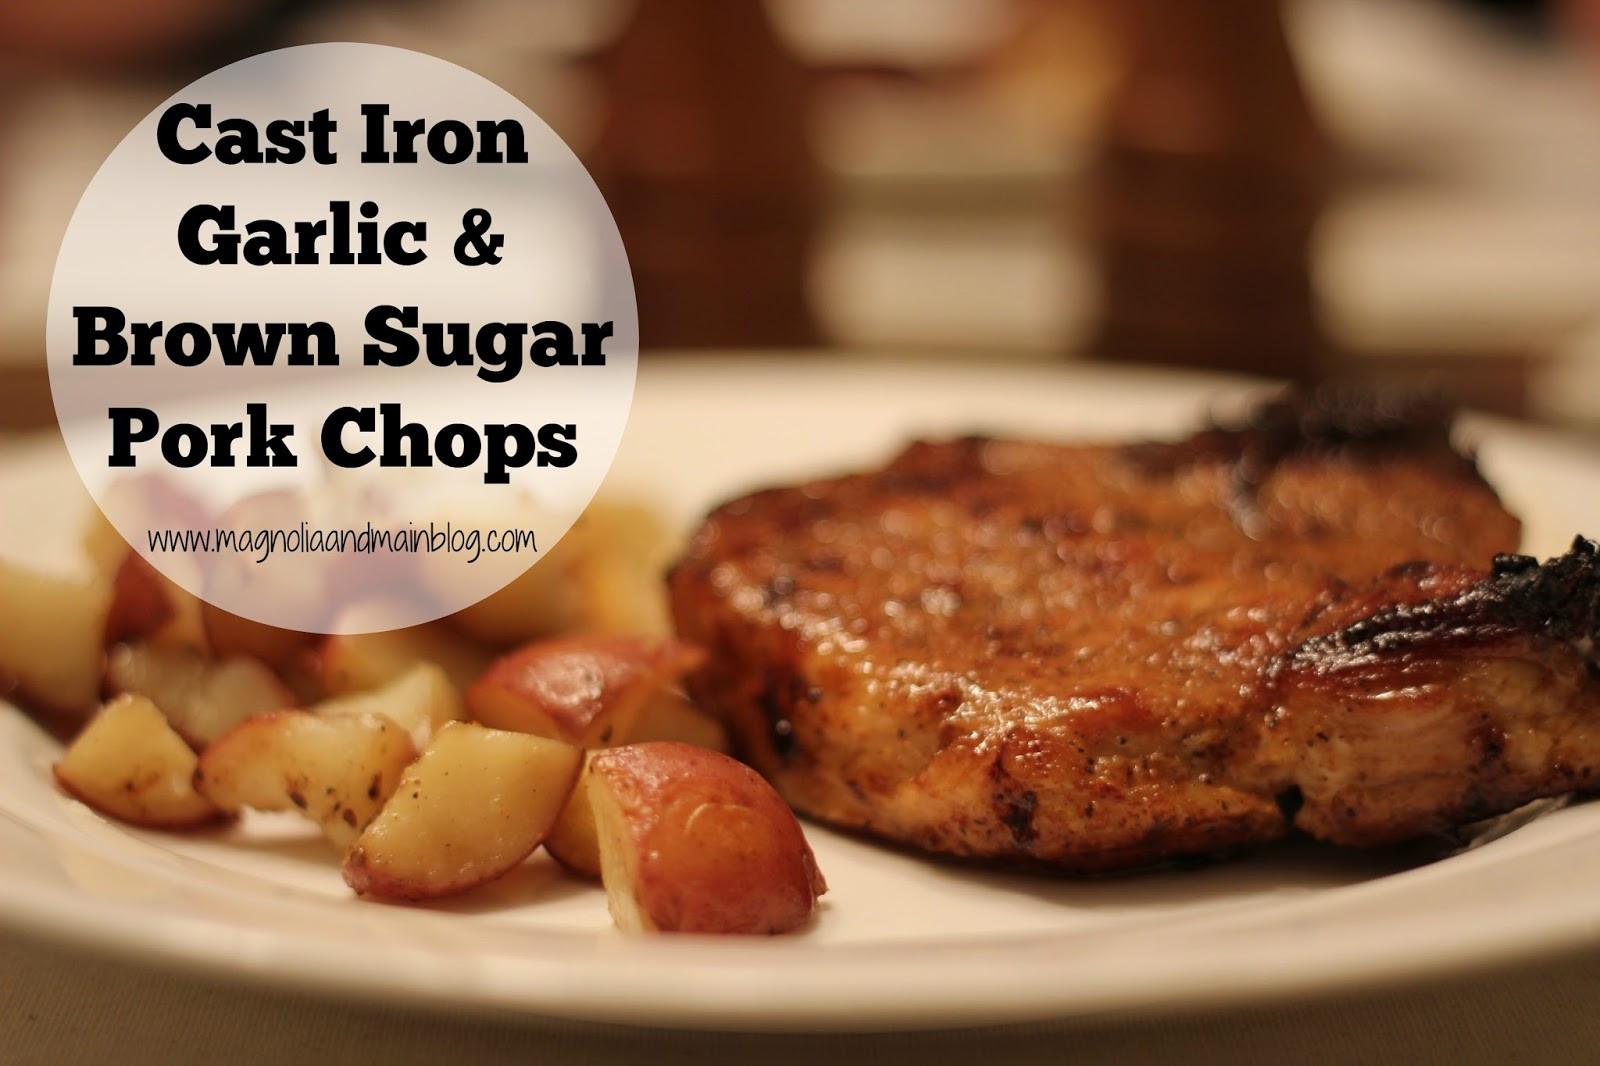 Cast Iron Skillet Boneless Pork Chops  Magnolia & Main Recipe Cast Iron Garlic & Brown Sugar